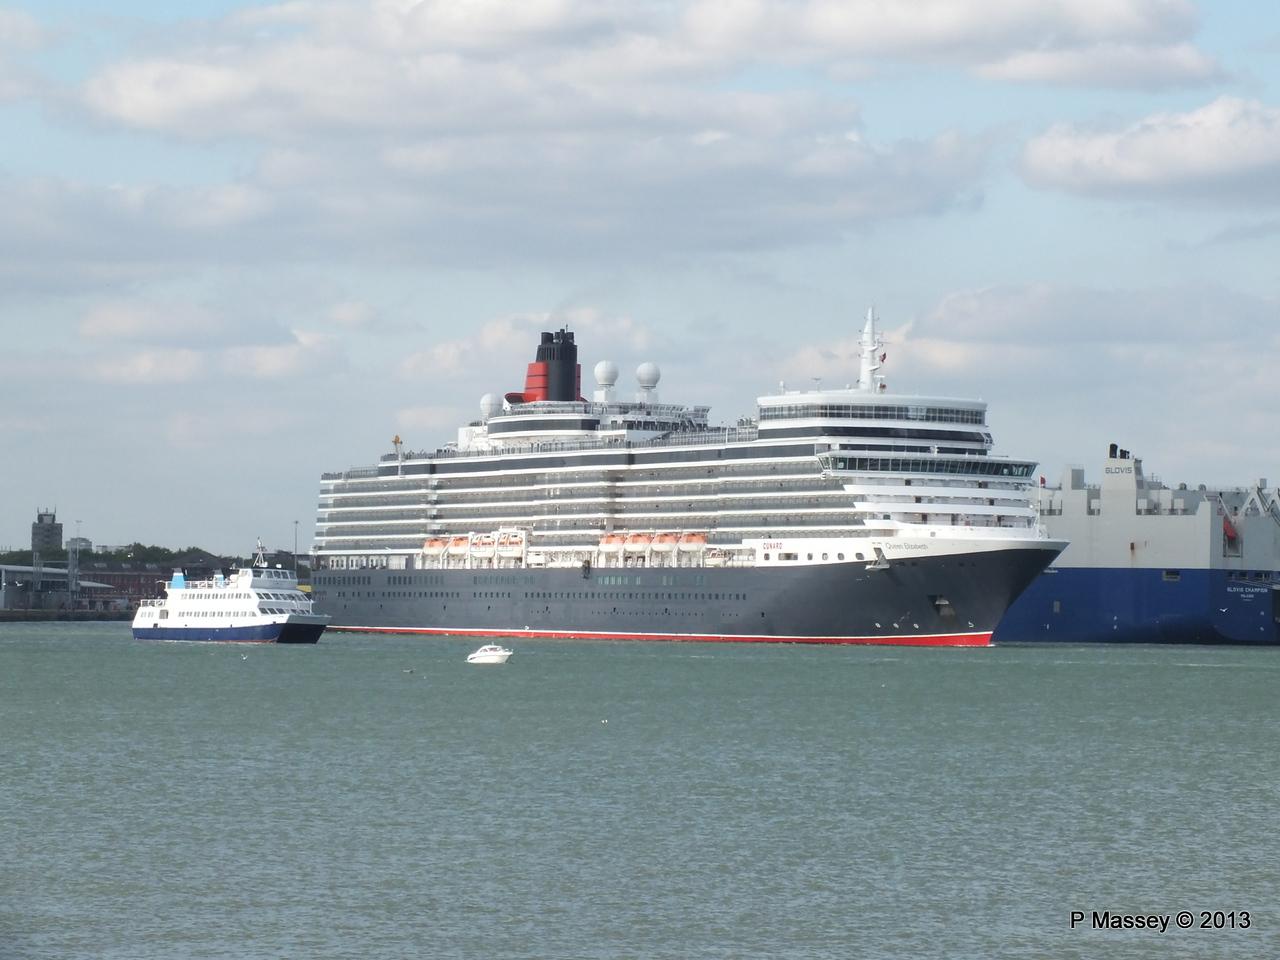 QUEEN ELIZABETH Departing Southampton OCEAN SCENE PDM 10-08-2013 17-48-52